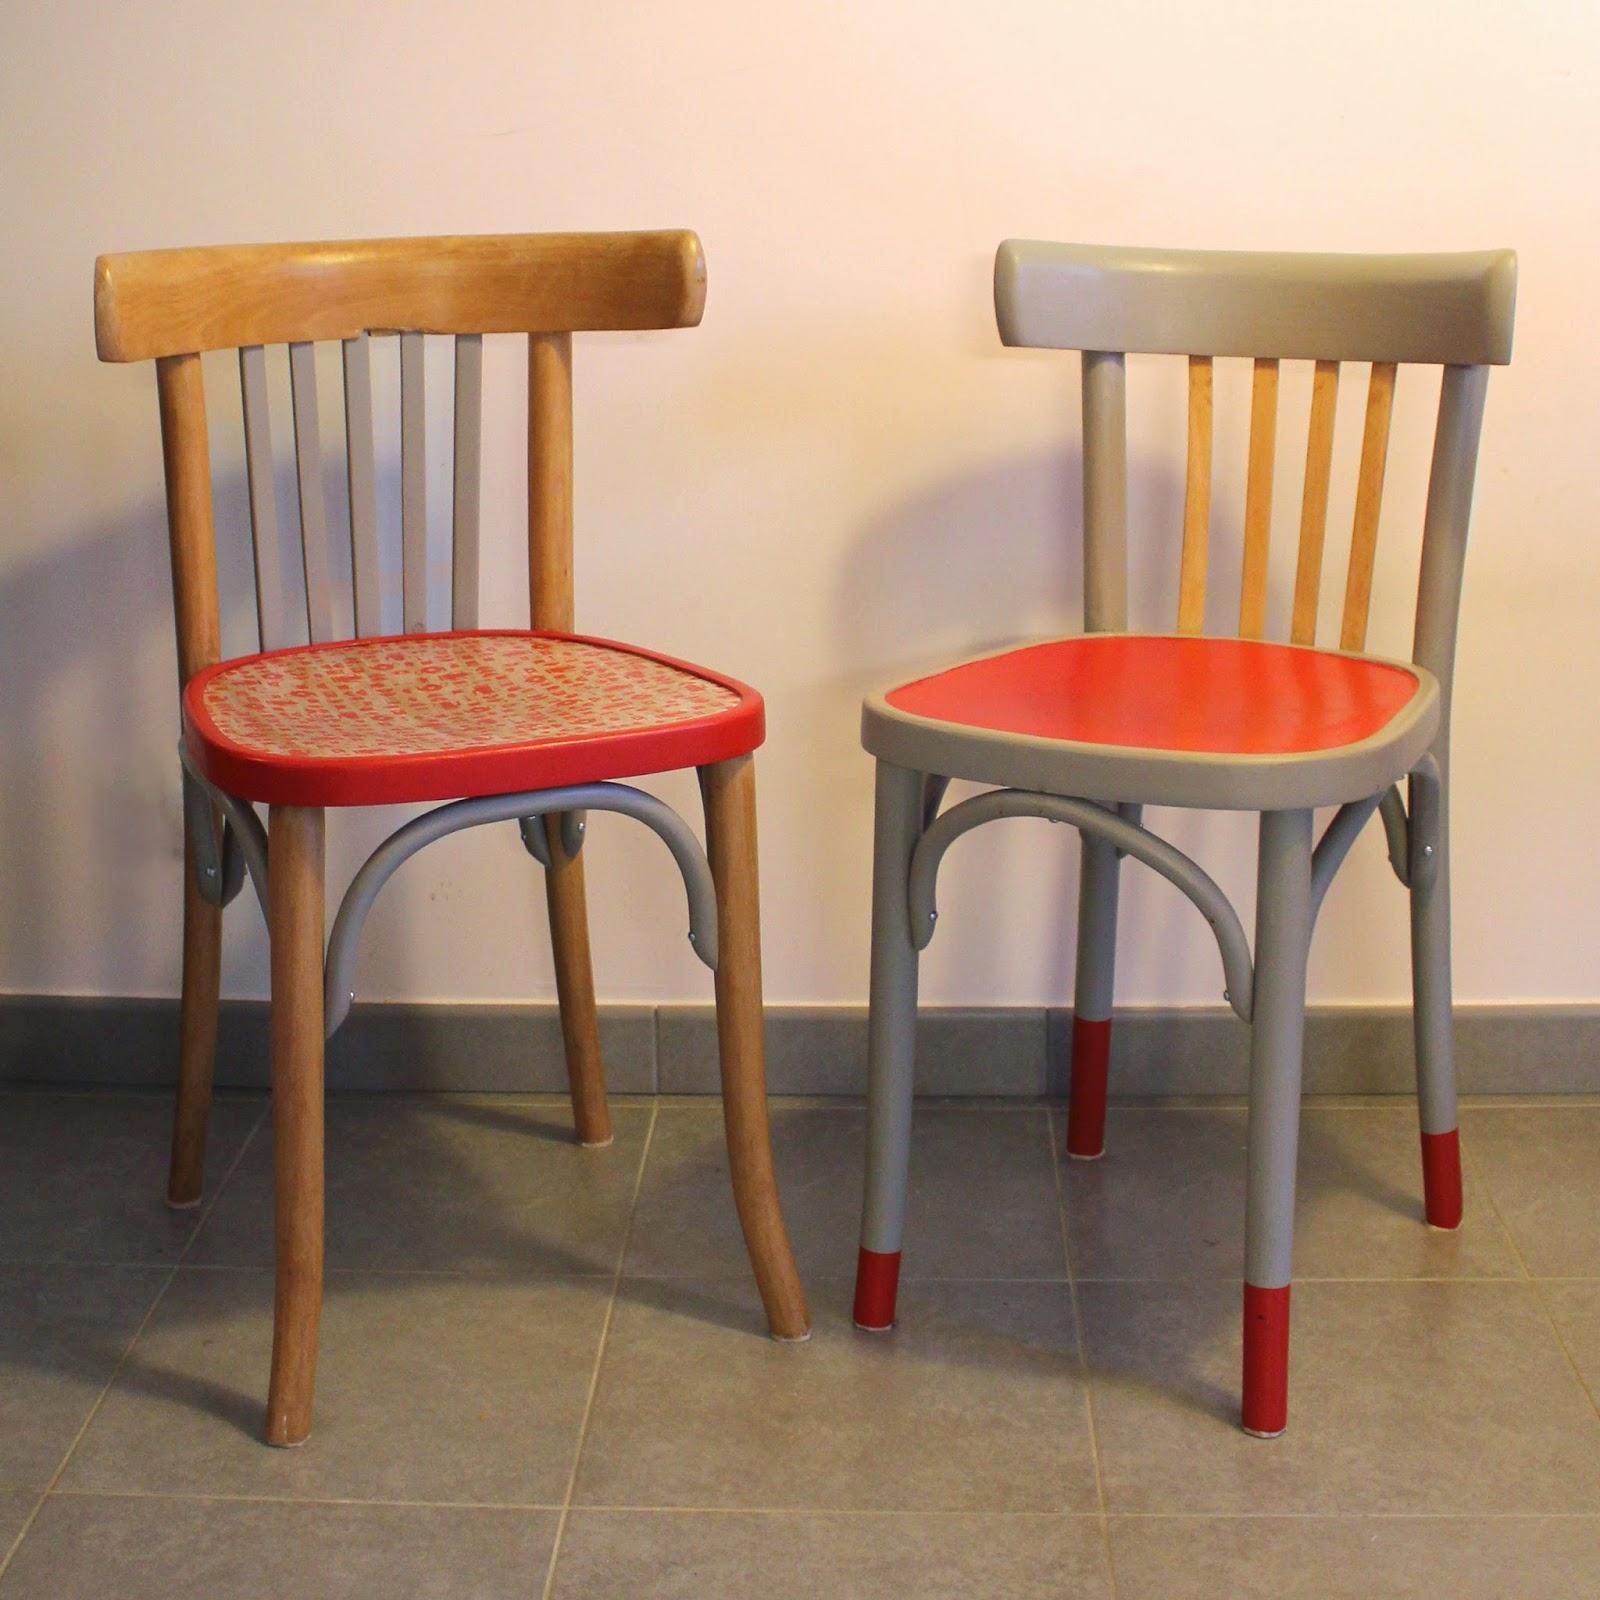 super cocotte 2nde vie 1 chaises bistro. Black Bedroom Furniture Sets. Home Design Ideas